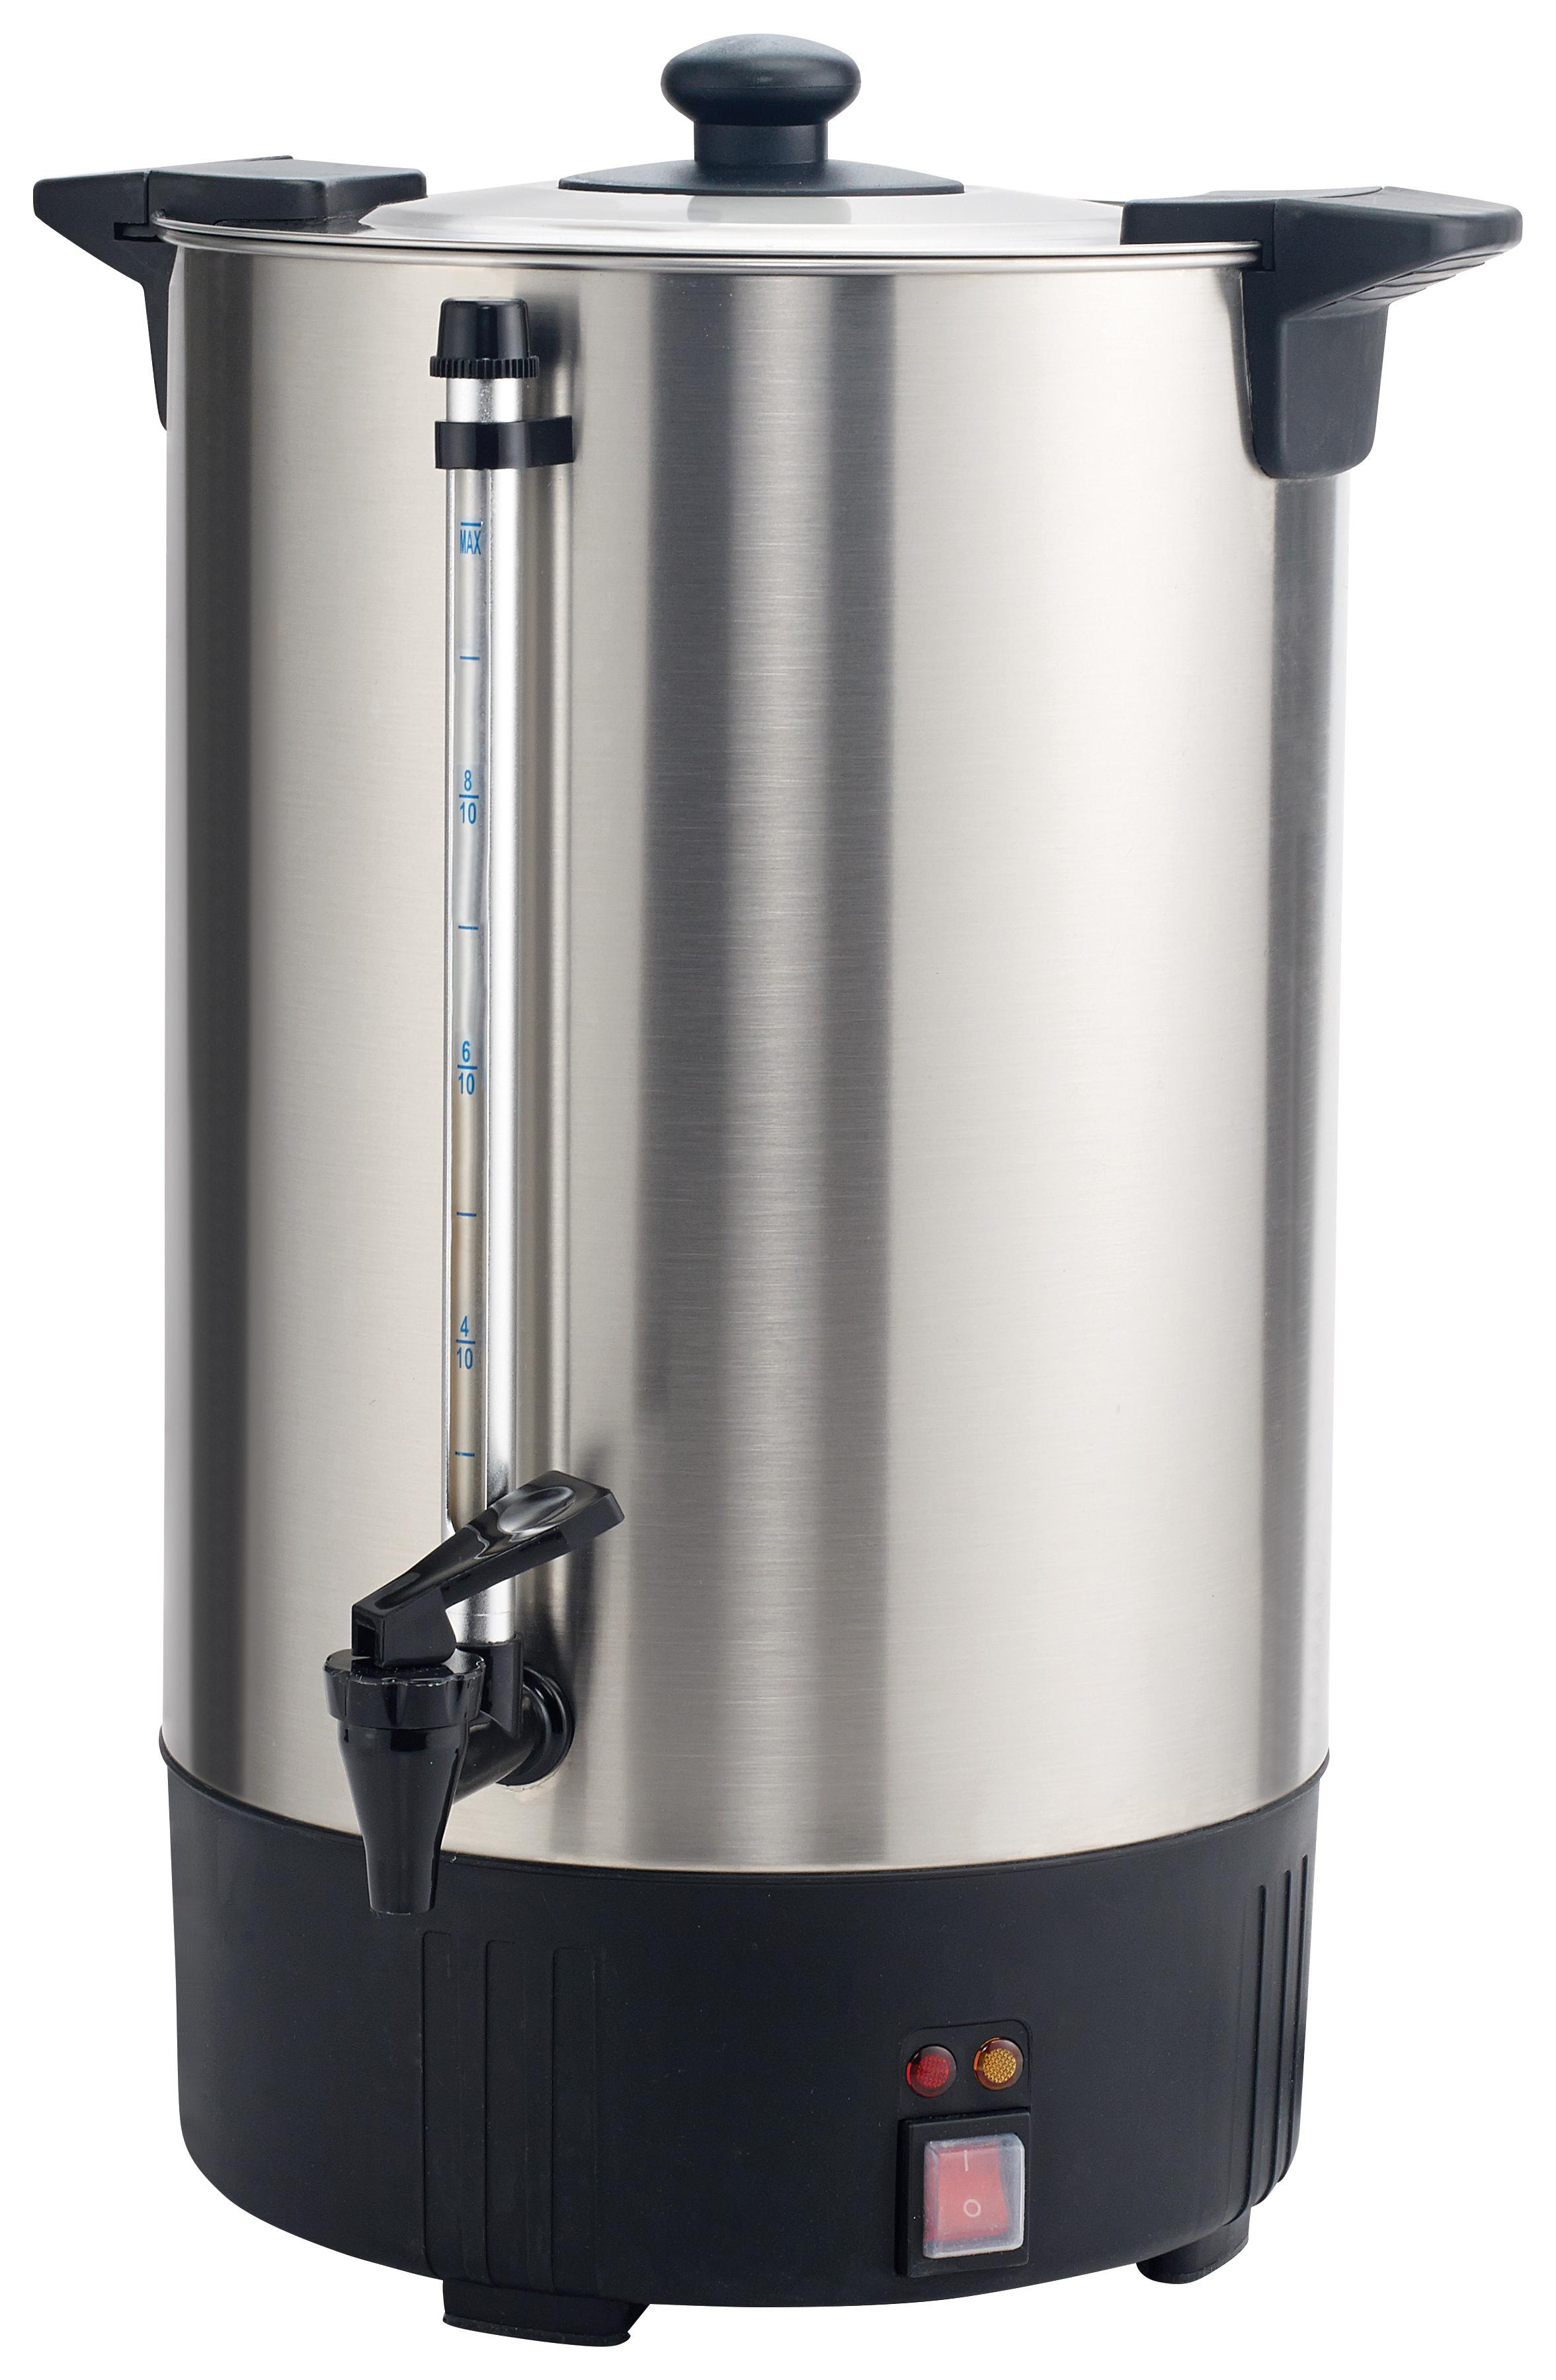 Winco EWB-100A water boiler